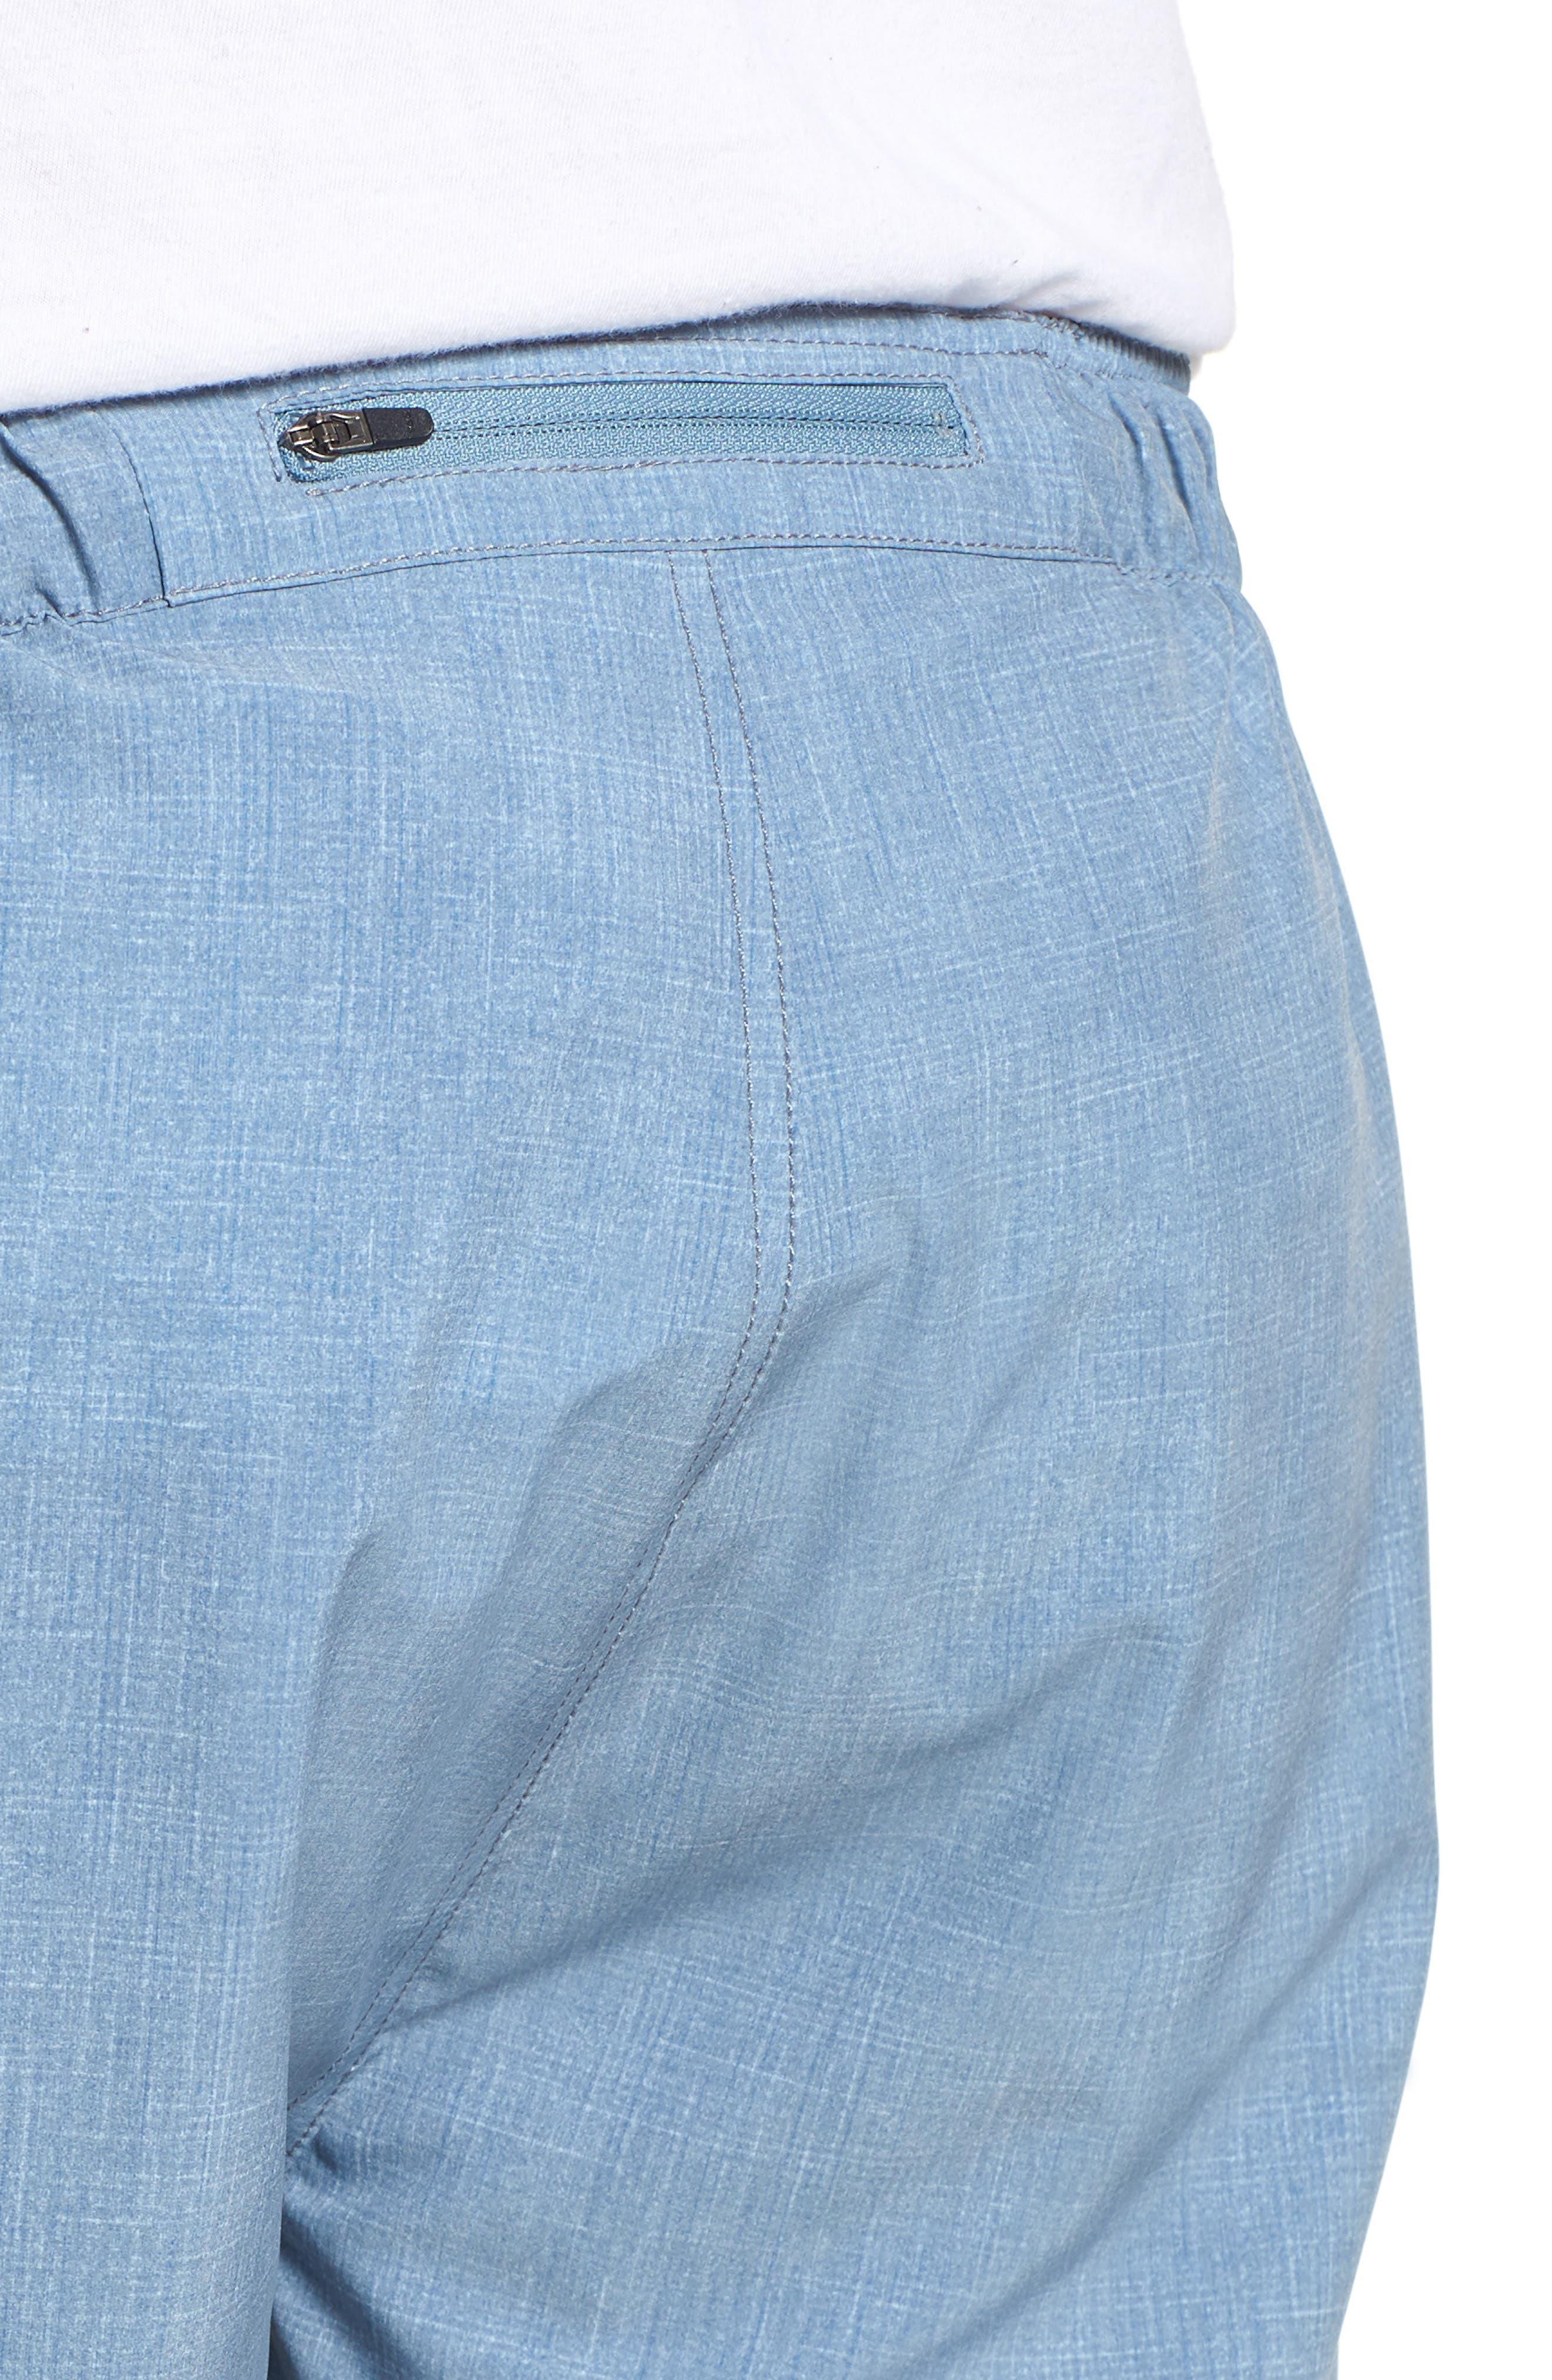 Digits Shorts,                             Alternate thumbnail 4, color,                             HEATHER SHARKSKIN